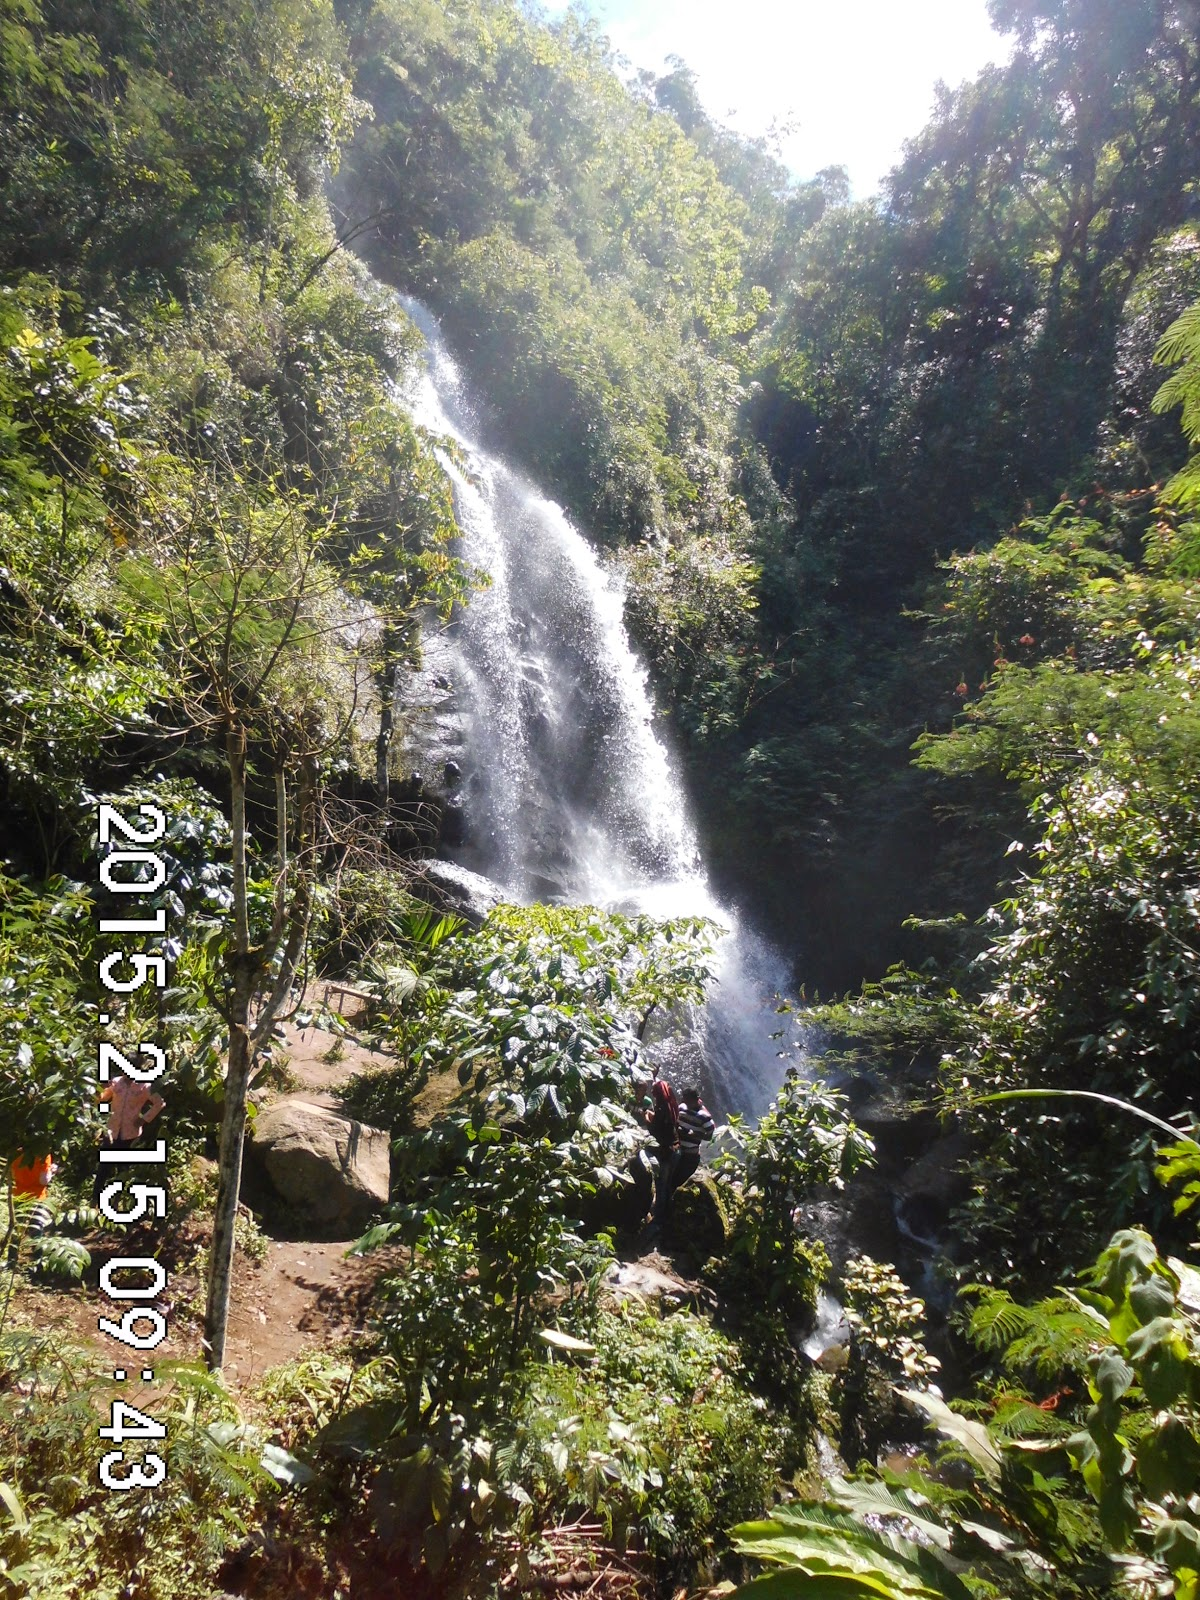 Wisata Alam Budaya Air Terjun Grojogan Watu Jonggol Kebun Lokasi